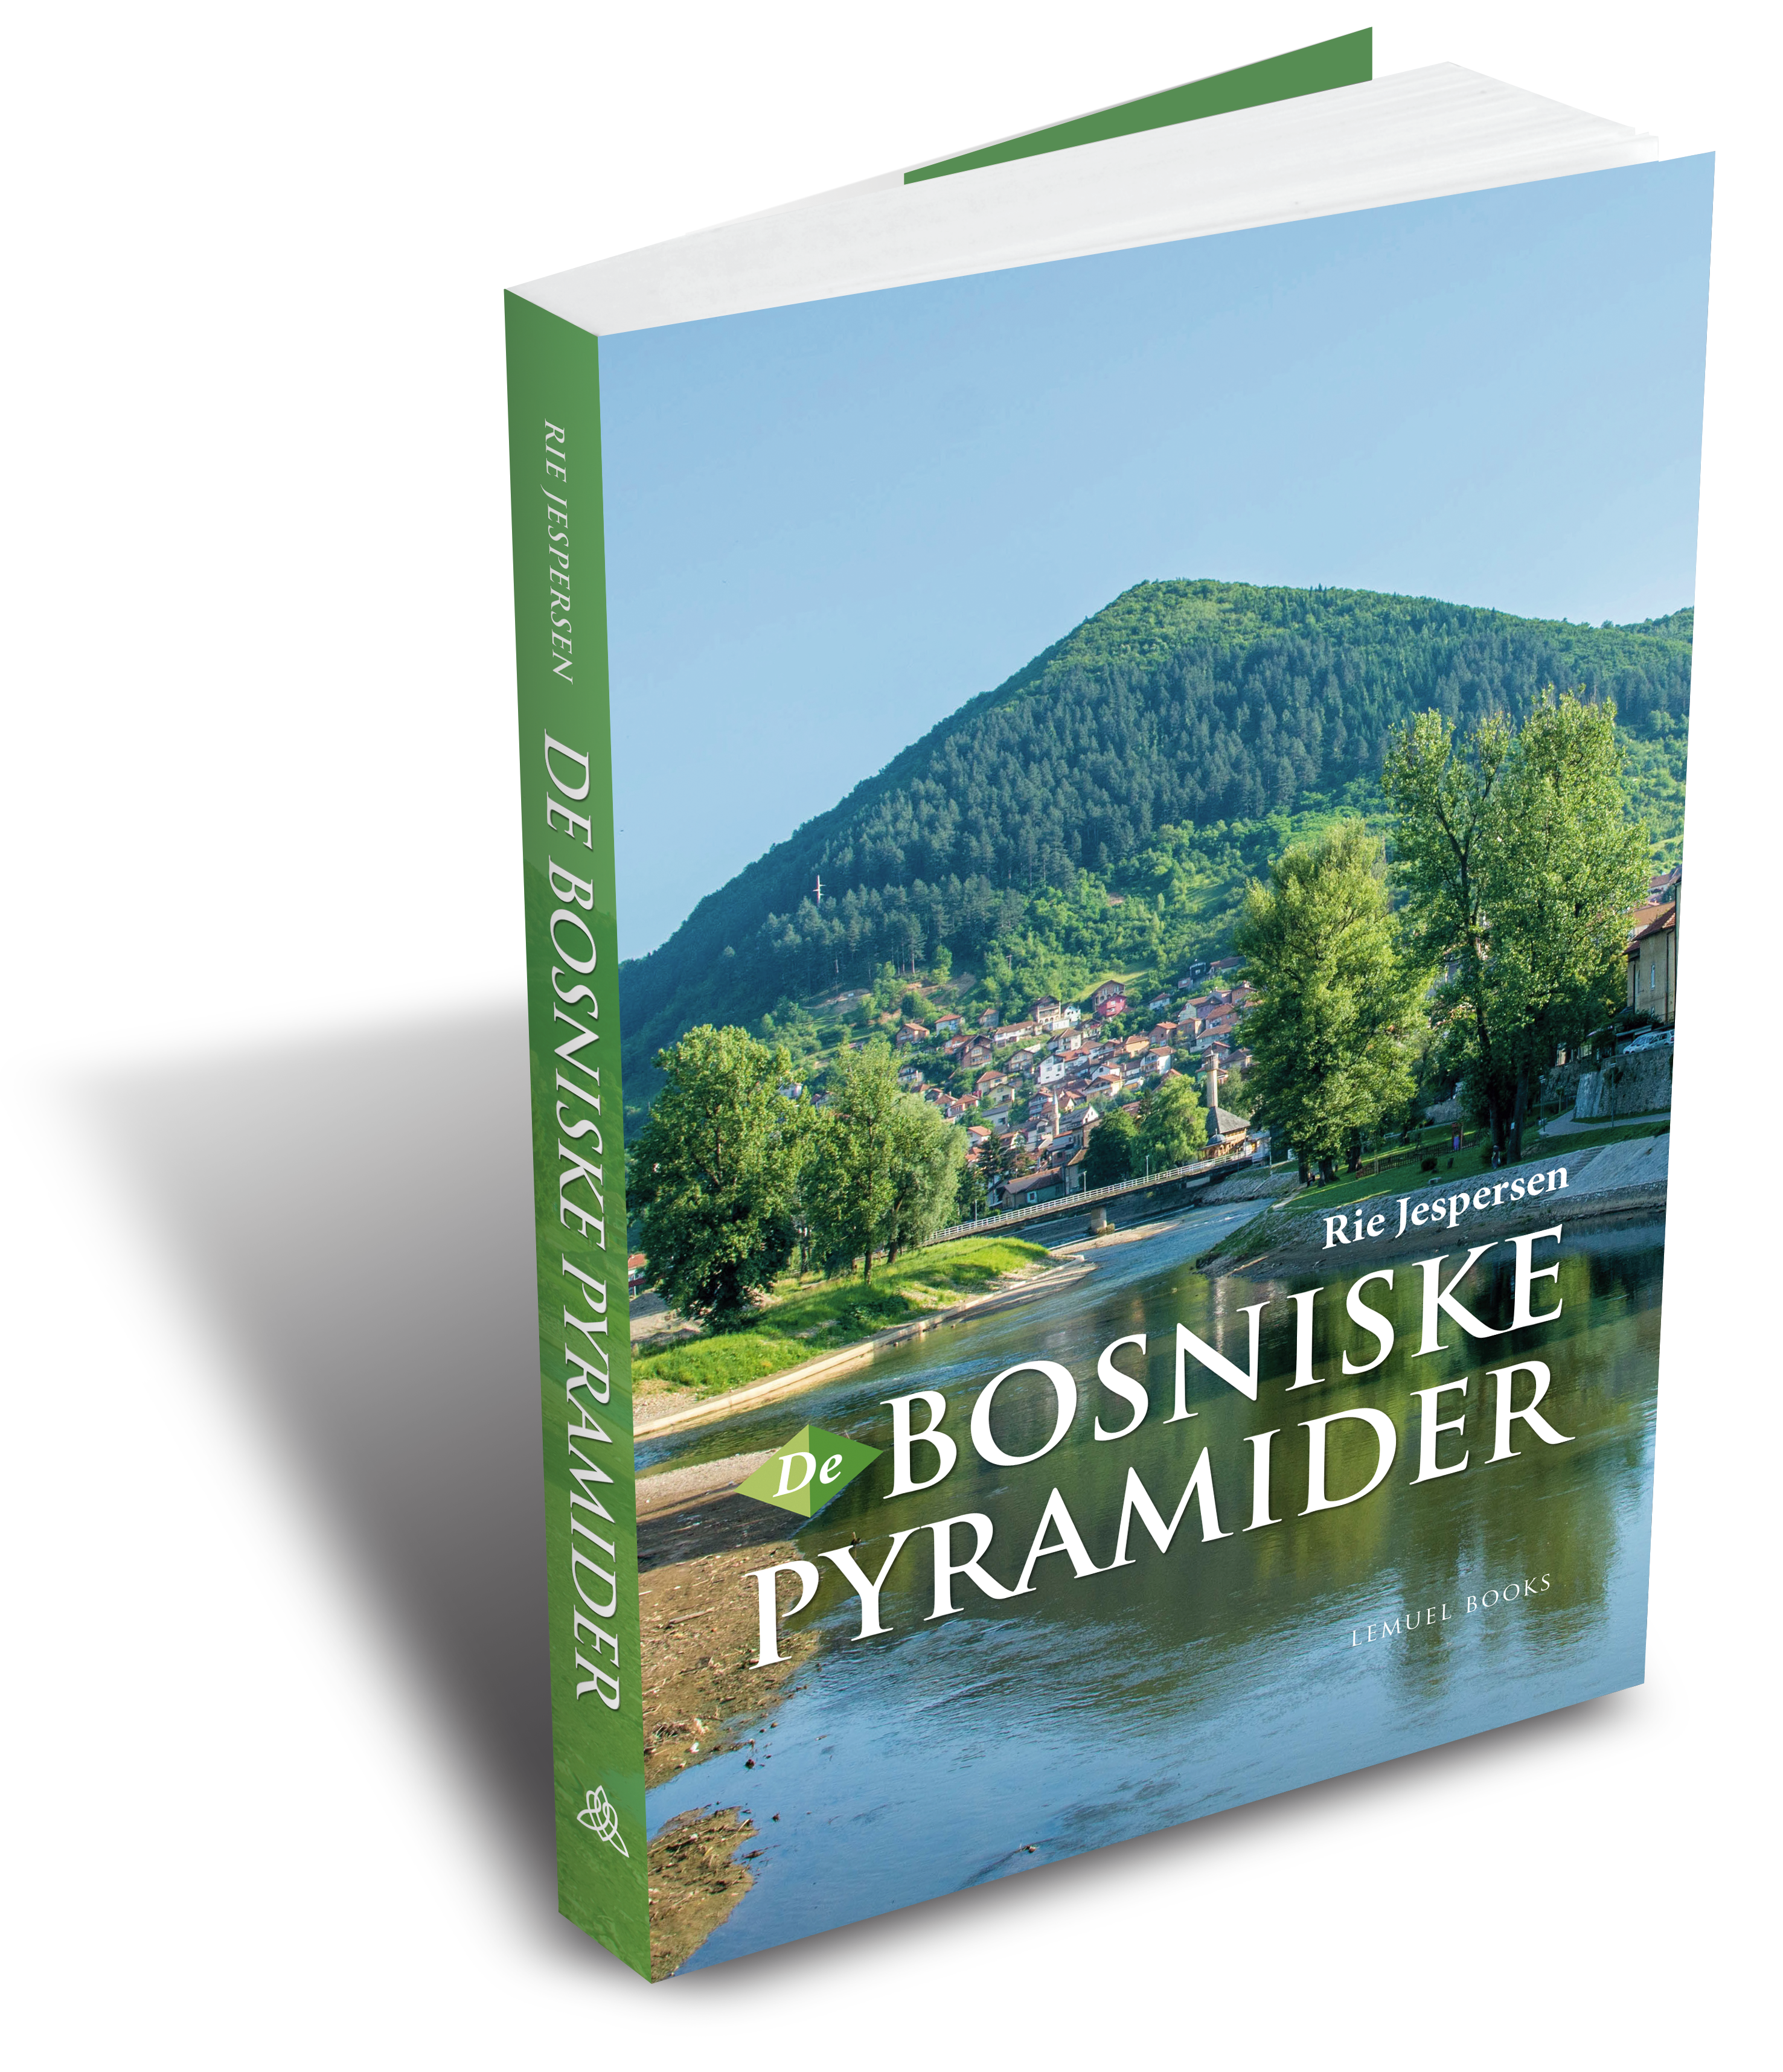 De Bosniske Pyramider